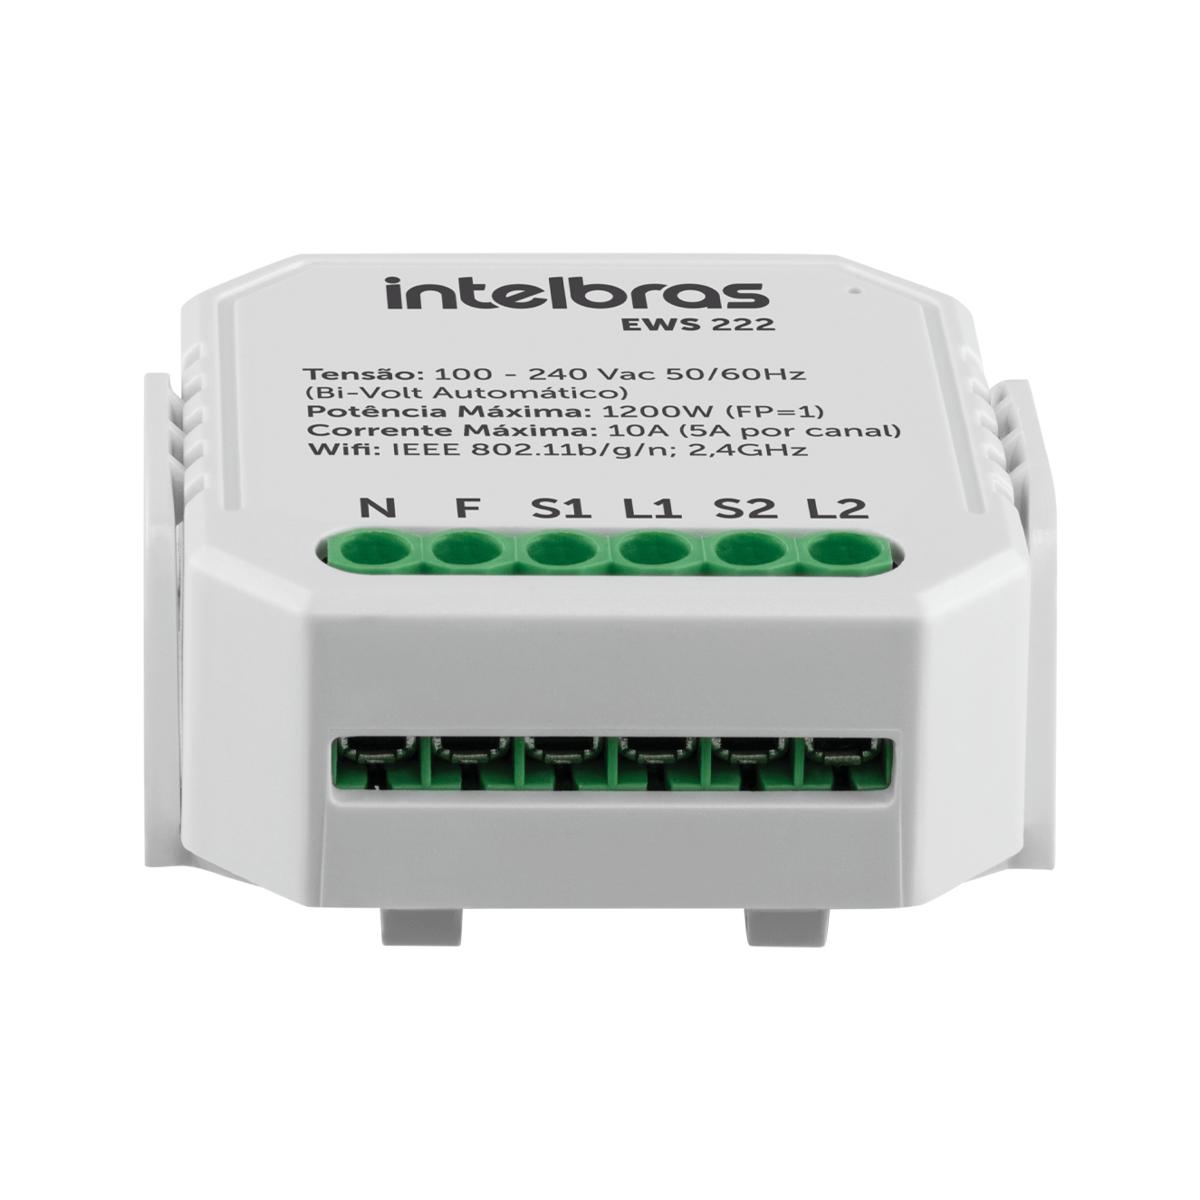 Mini Controlador Smart Wi-Fi Intelbras Entrada 2 Interruptores EWS 222